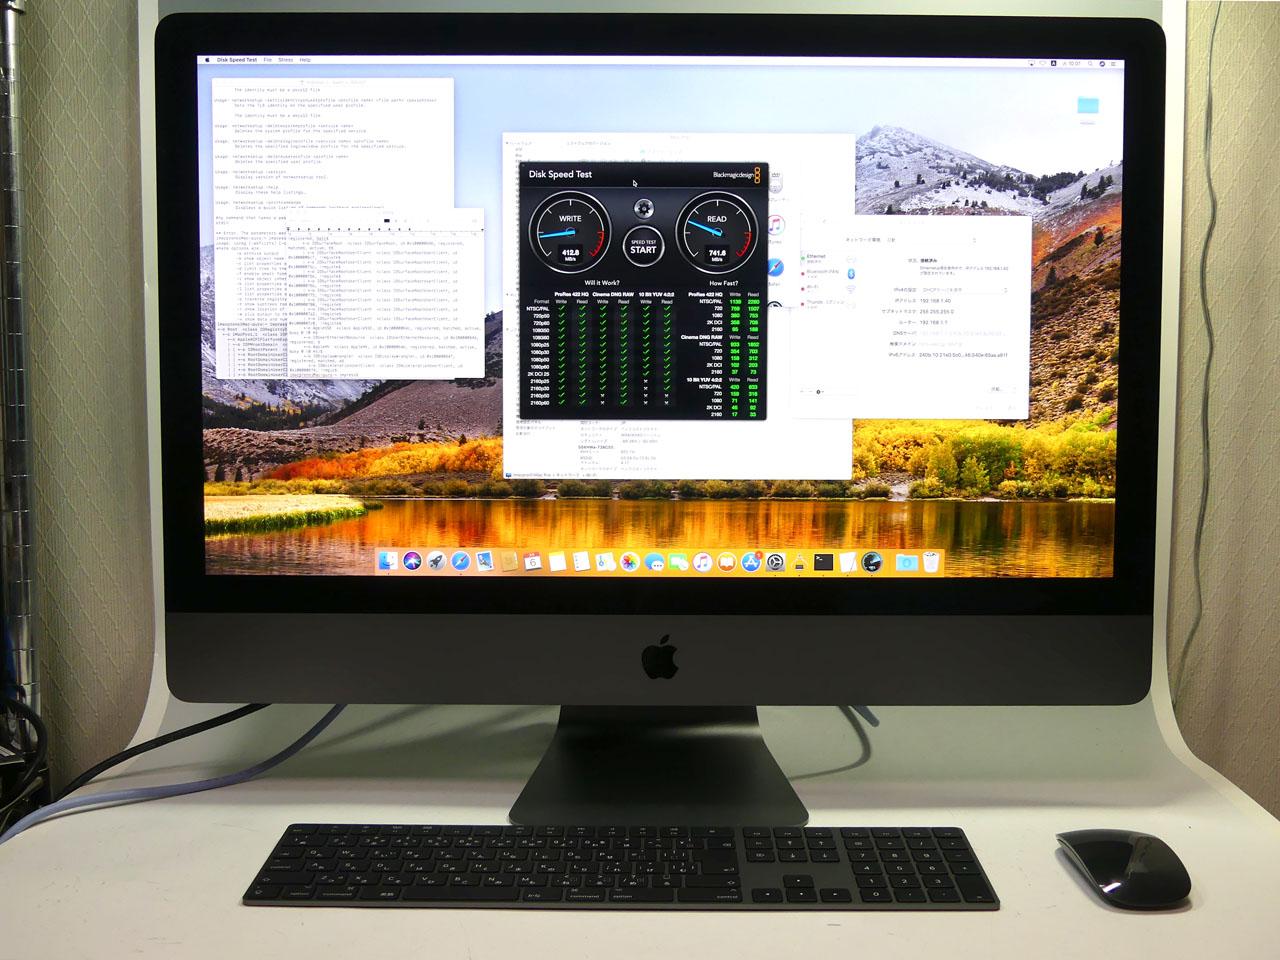 "iMac Pro 27""(Late 2017)。Xeon W(3.2GHz、8コア)、32GBメモリ、1TB SSD、Radeon Pro Vega 56搭載モデル"